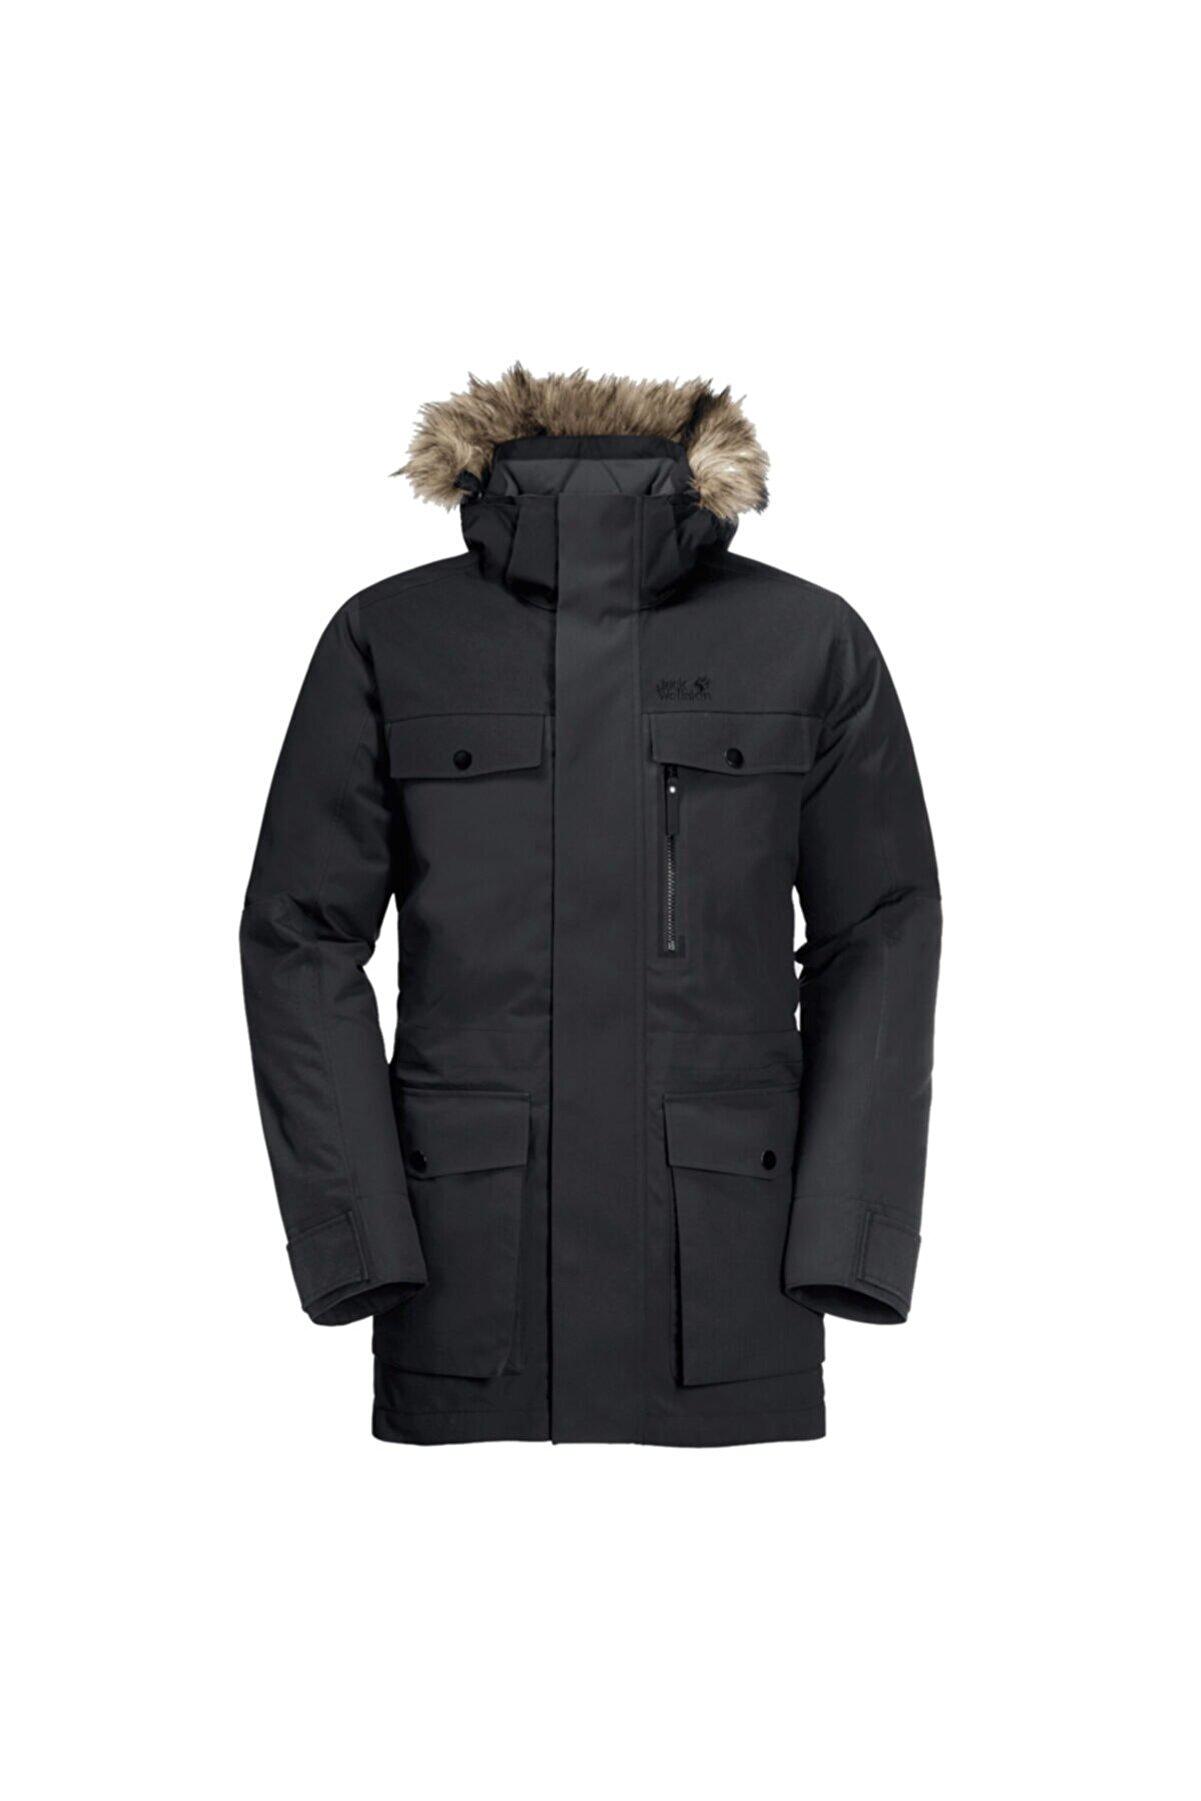 Jack Wolfskin Erkek Siyah Glacier Bay Outdoor Parka 1113321-6000